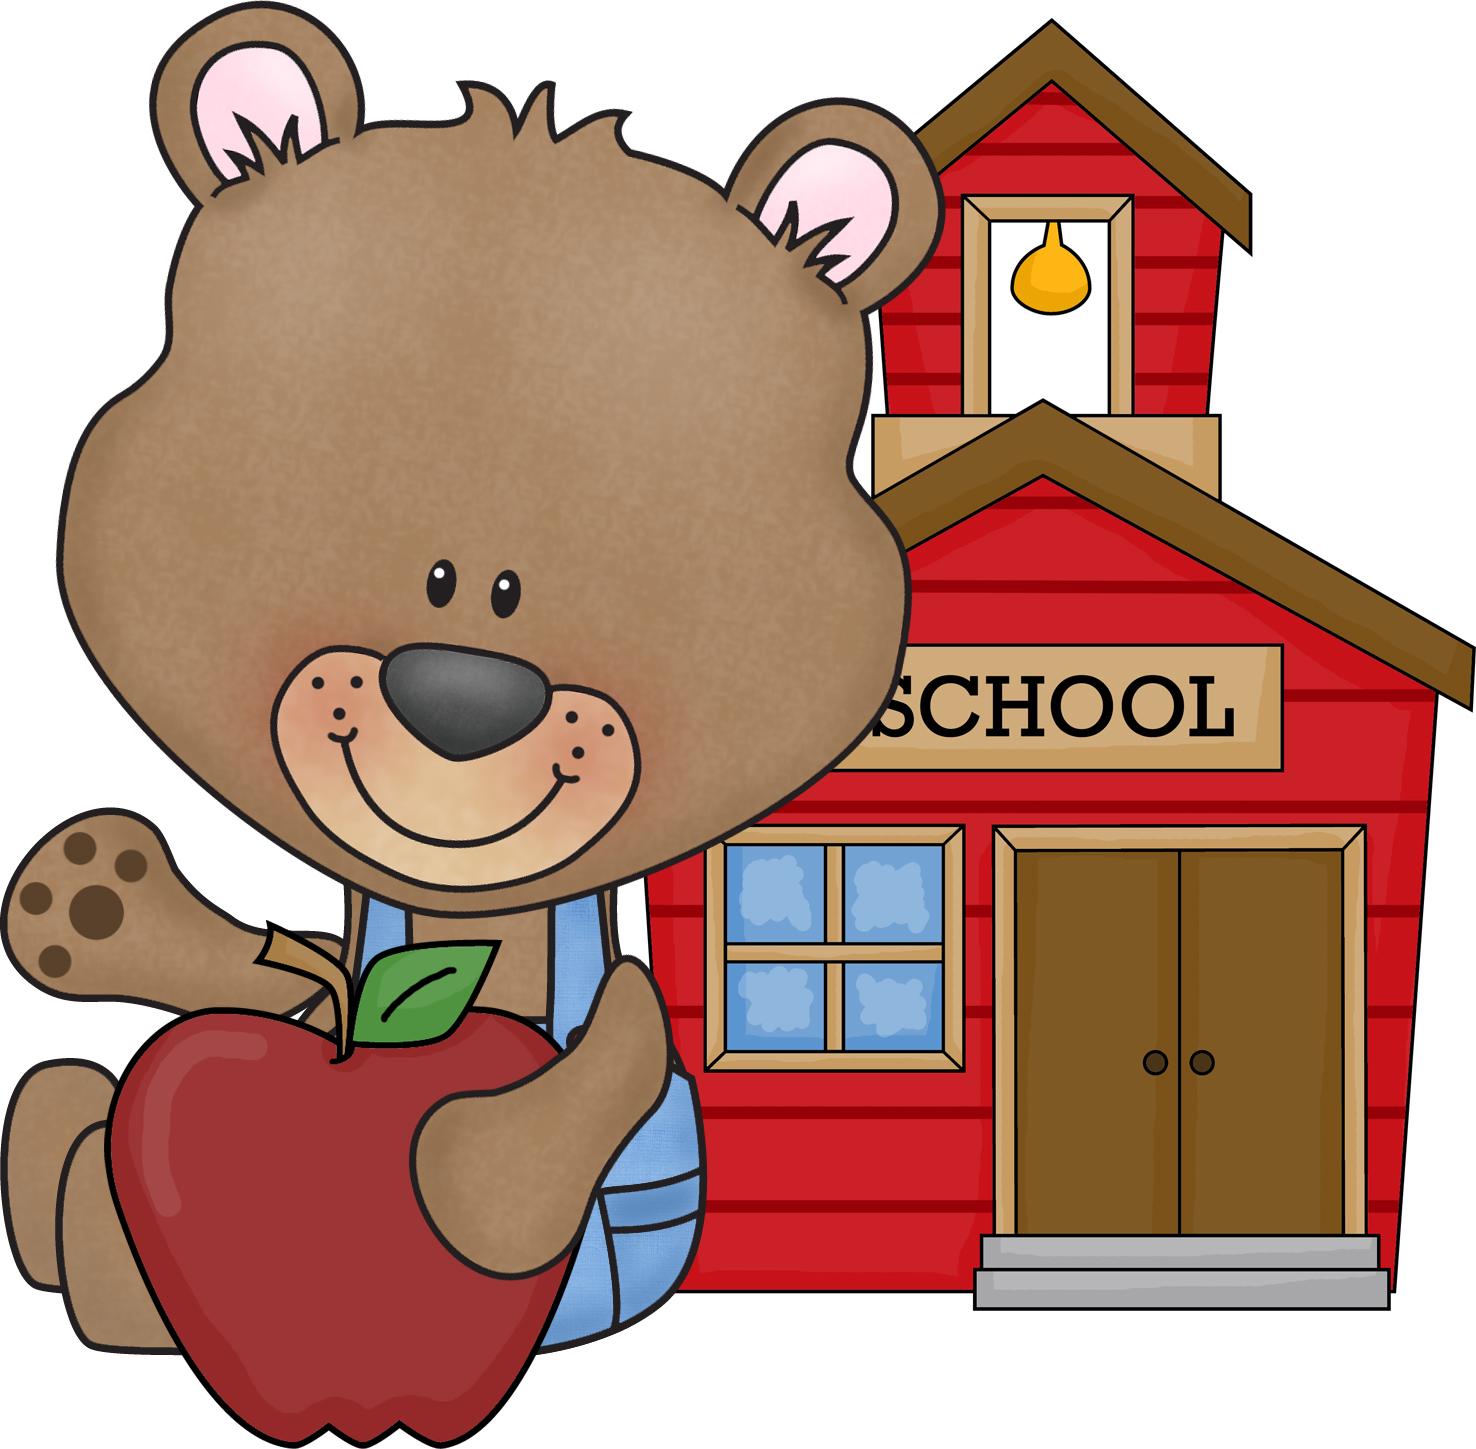 1476x1449 Cute Schoolhouse Clipart. Cute Schoolhouse Clipart S